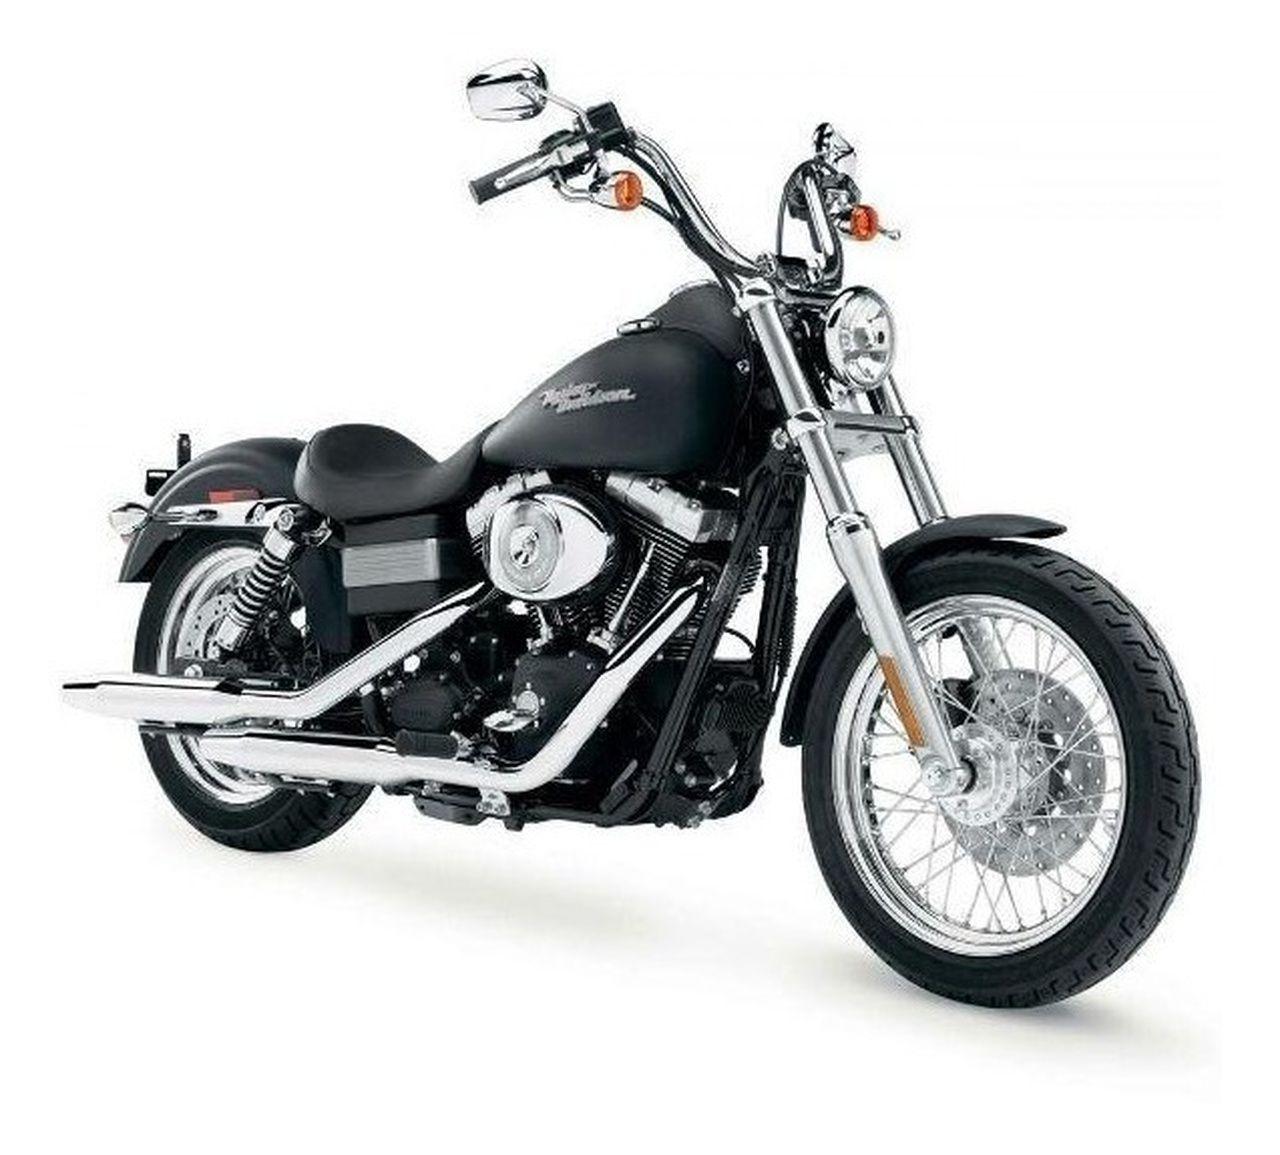 Miniatura Moto 2006 Dyna Street Bob: Harley Davidson (Serie 34) Escala 1/18 - Maisco